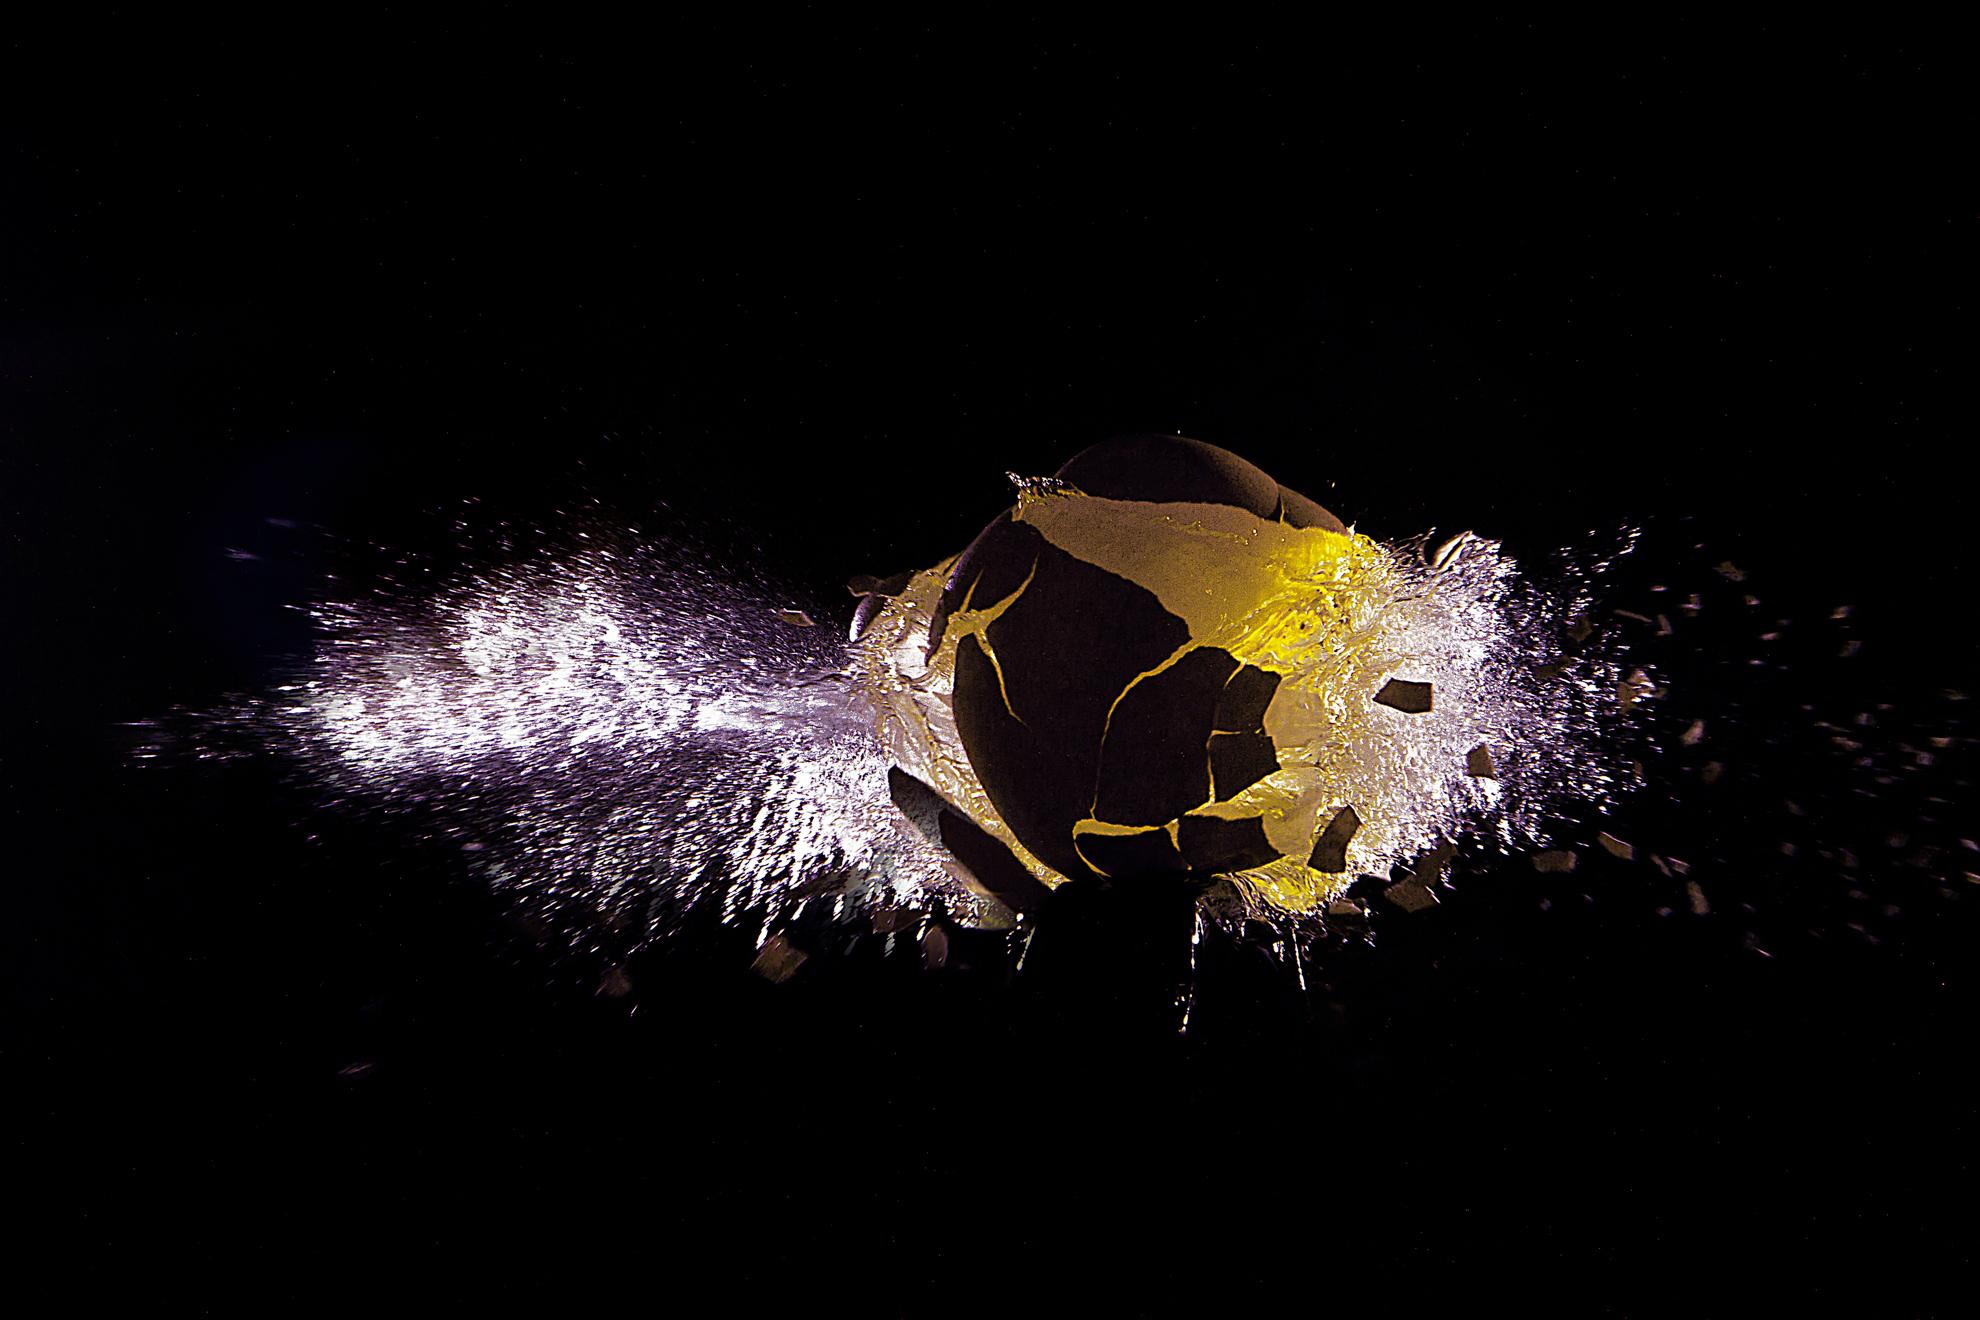 big bang : sia la luce e la luce fù di massimo bertozzi